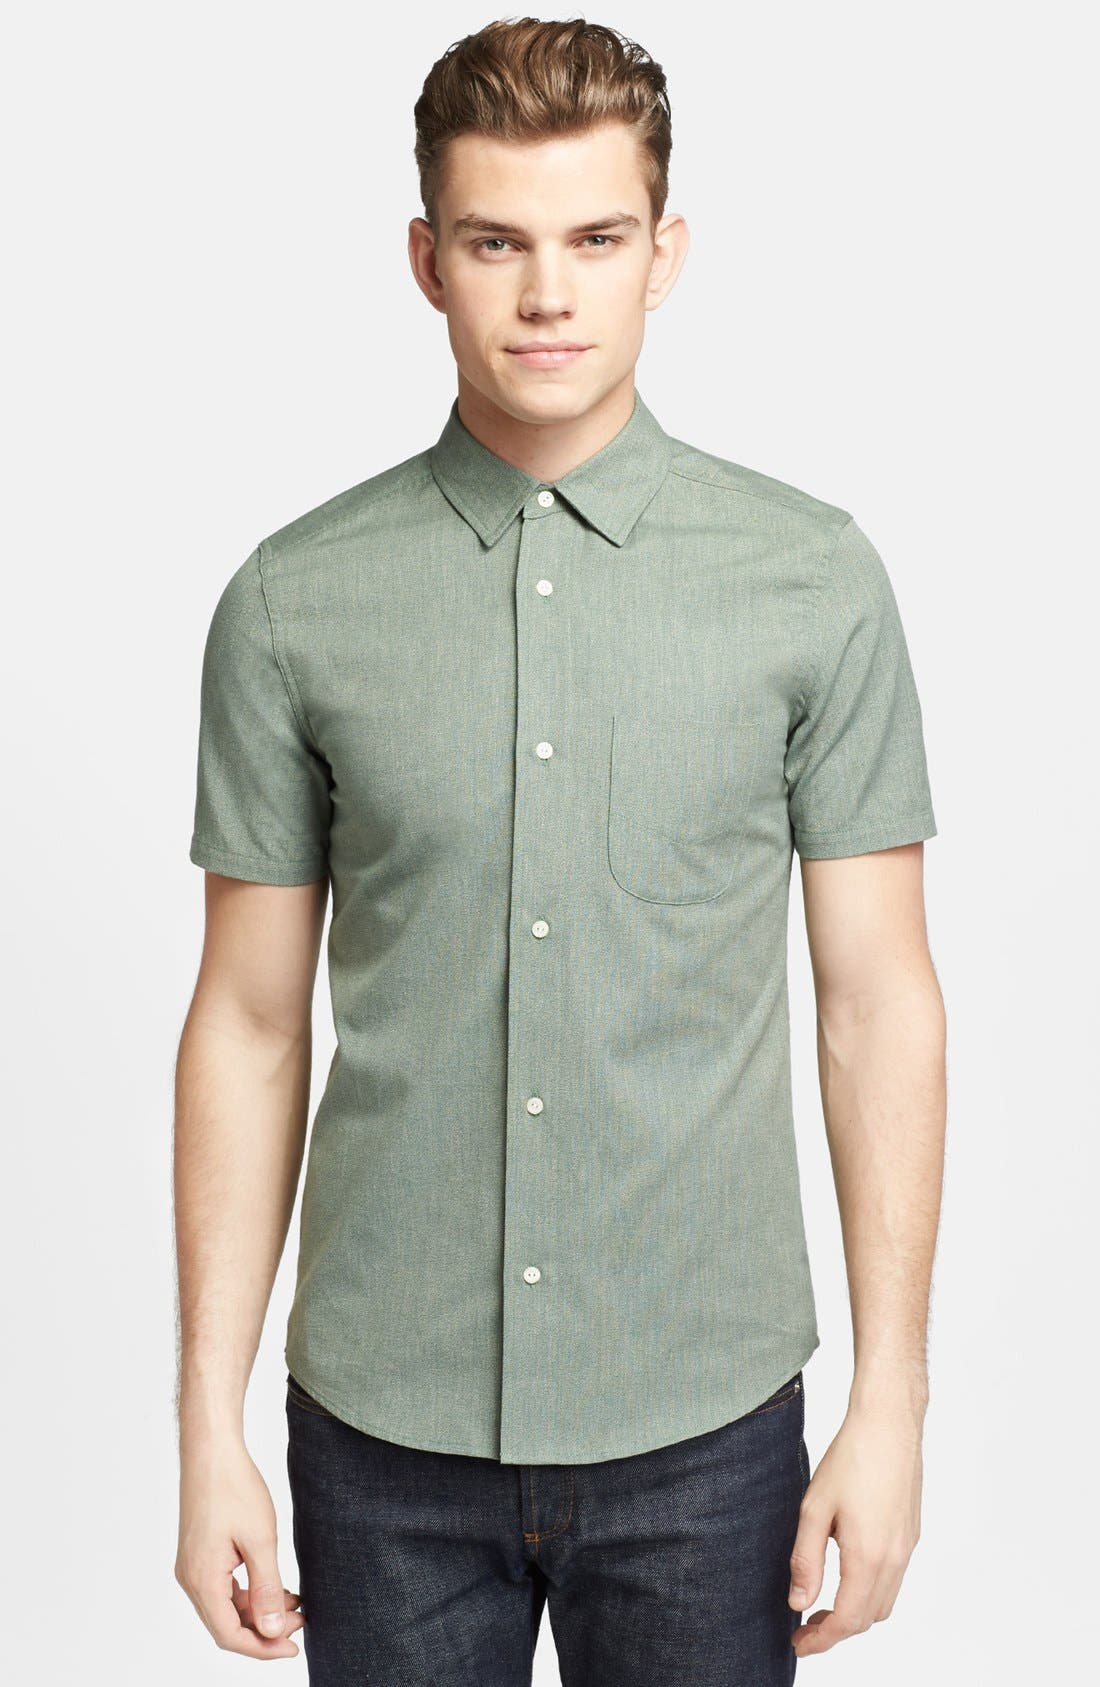 Alternate Image 1 Selected - Pendleton Portland Collection 'Yachats' Short Sleeve Selvedge Poplin Shirt